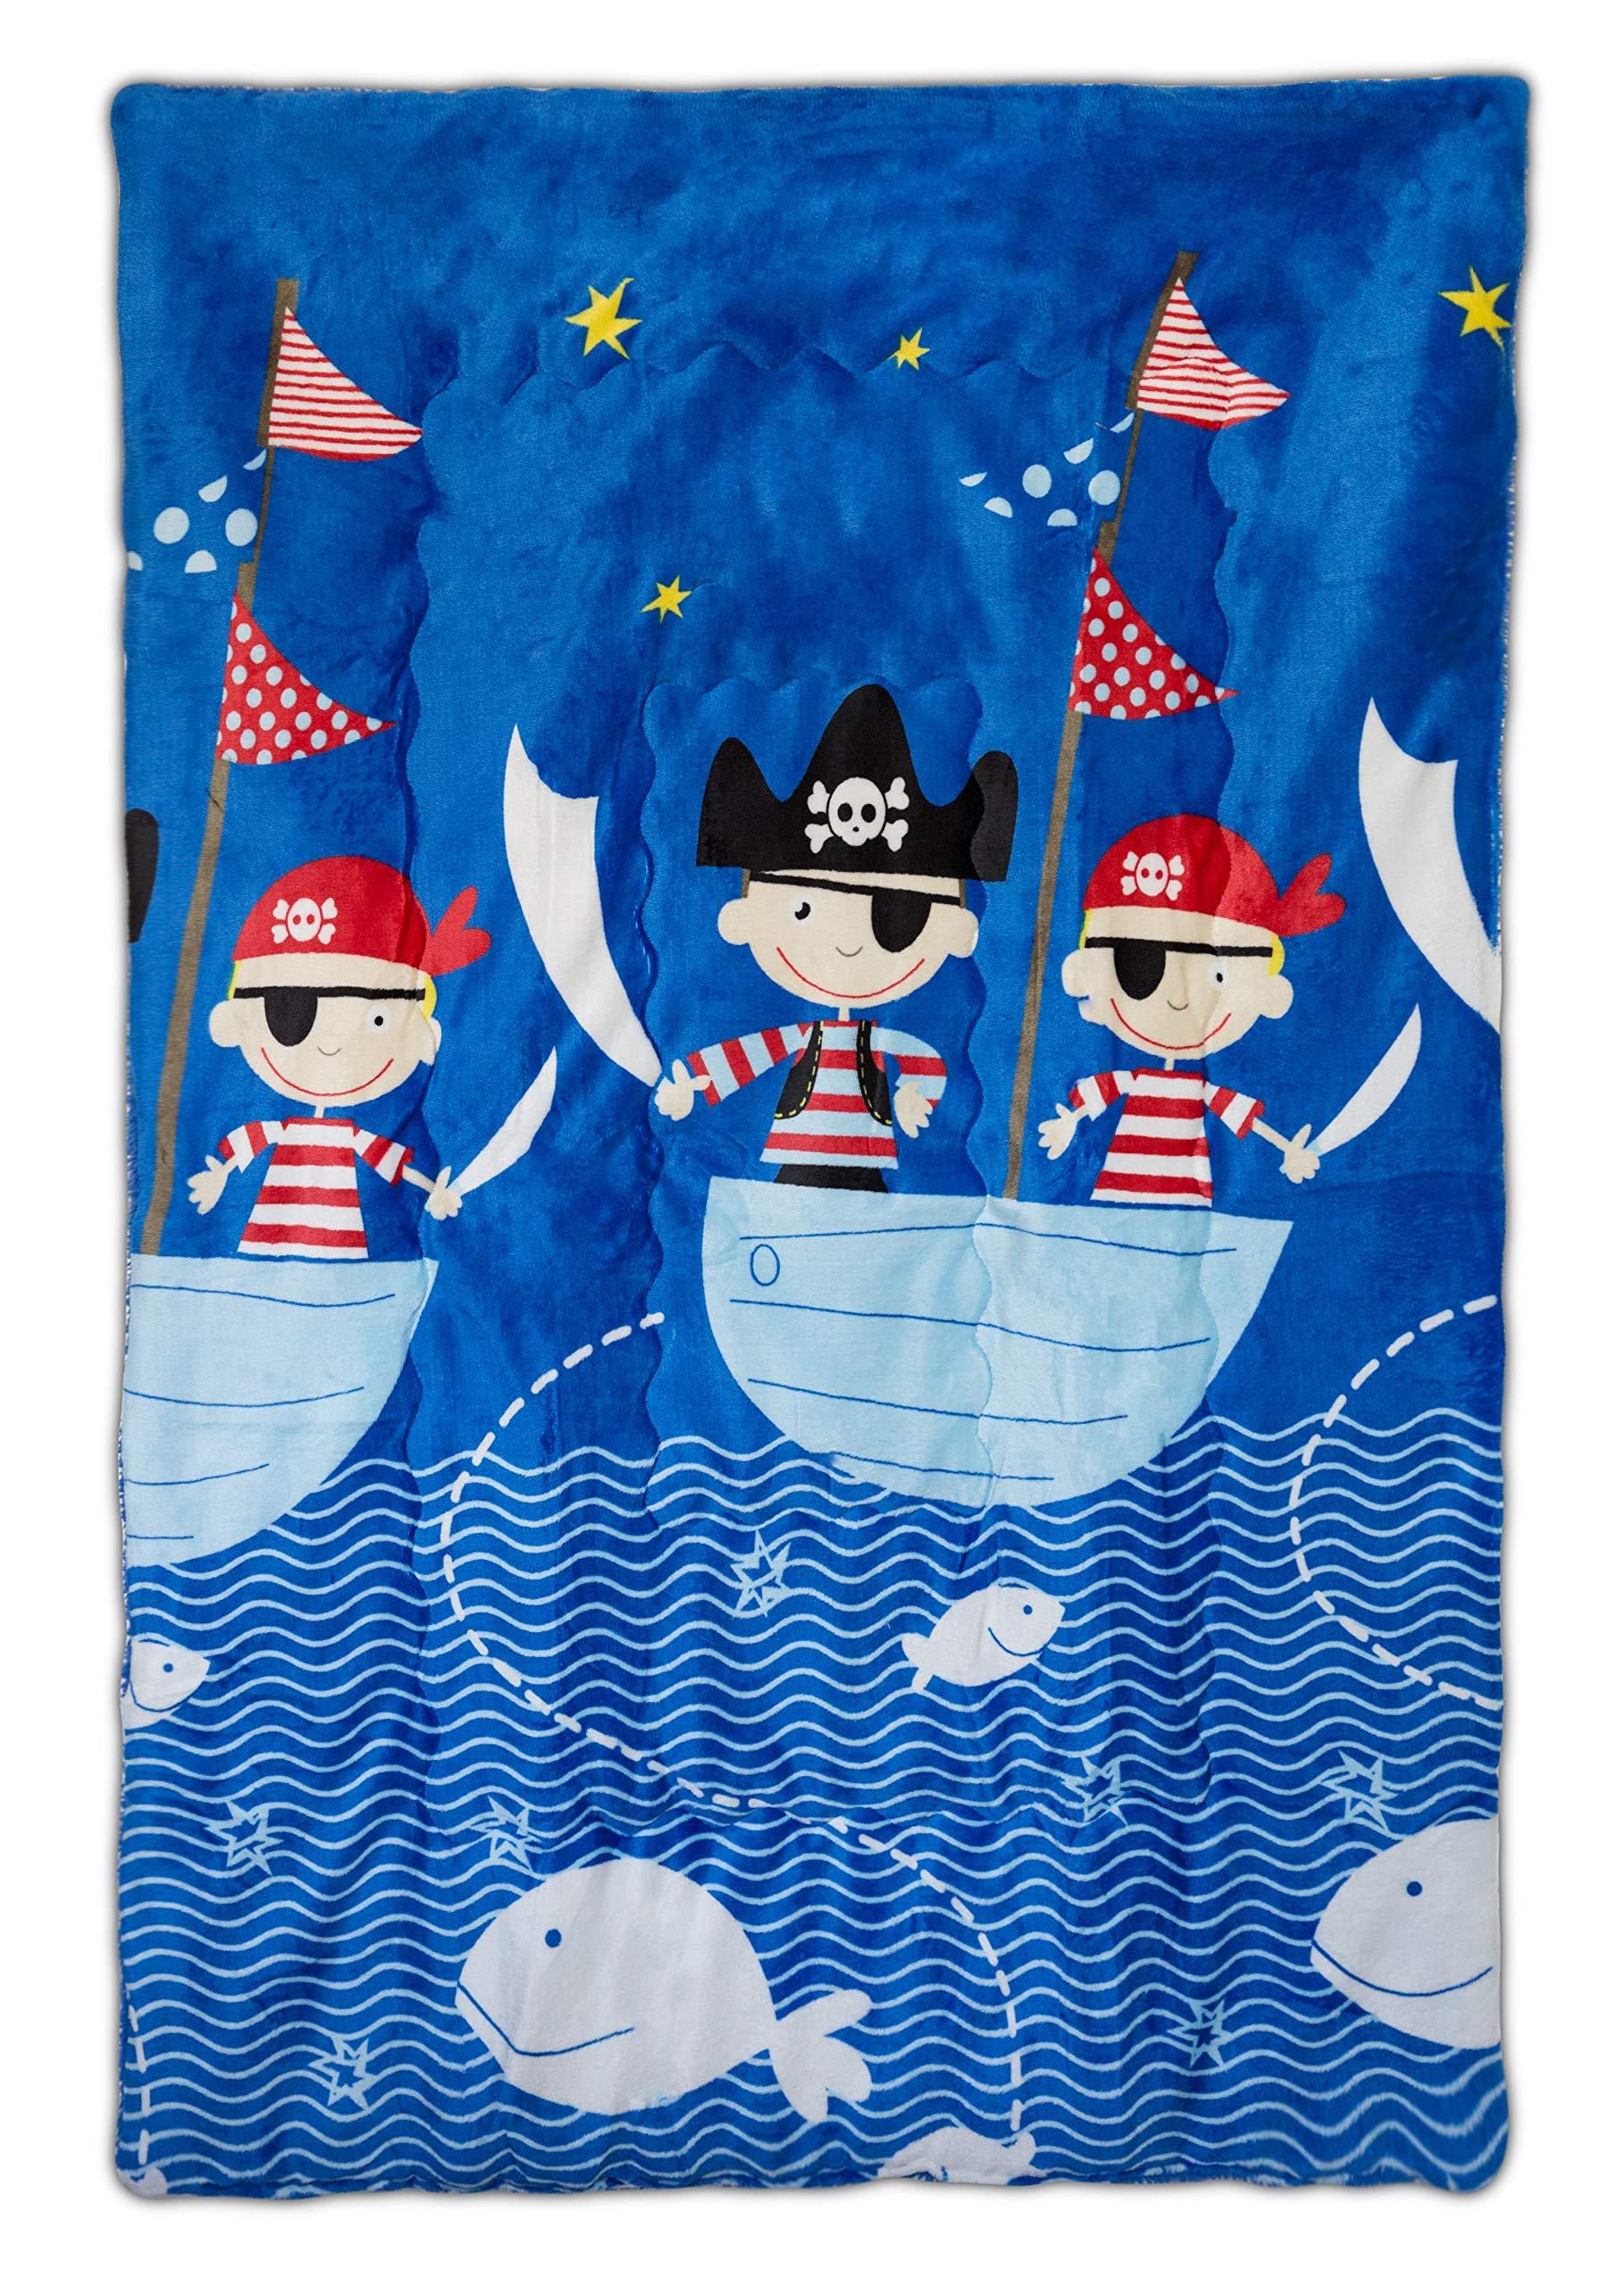 Elegant Home Blue Red White Black Pirates Ocean Ship Design Kids Soft & Warm Sherpa Baby Toddler Boy Blanket Printed Borrego Stroller or Baby Crib or Toddler Bed Blanket Plush Throw 40X50# Pirates